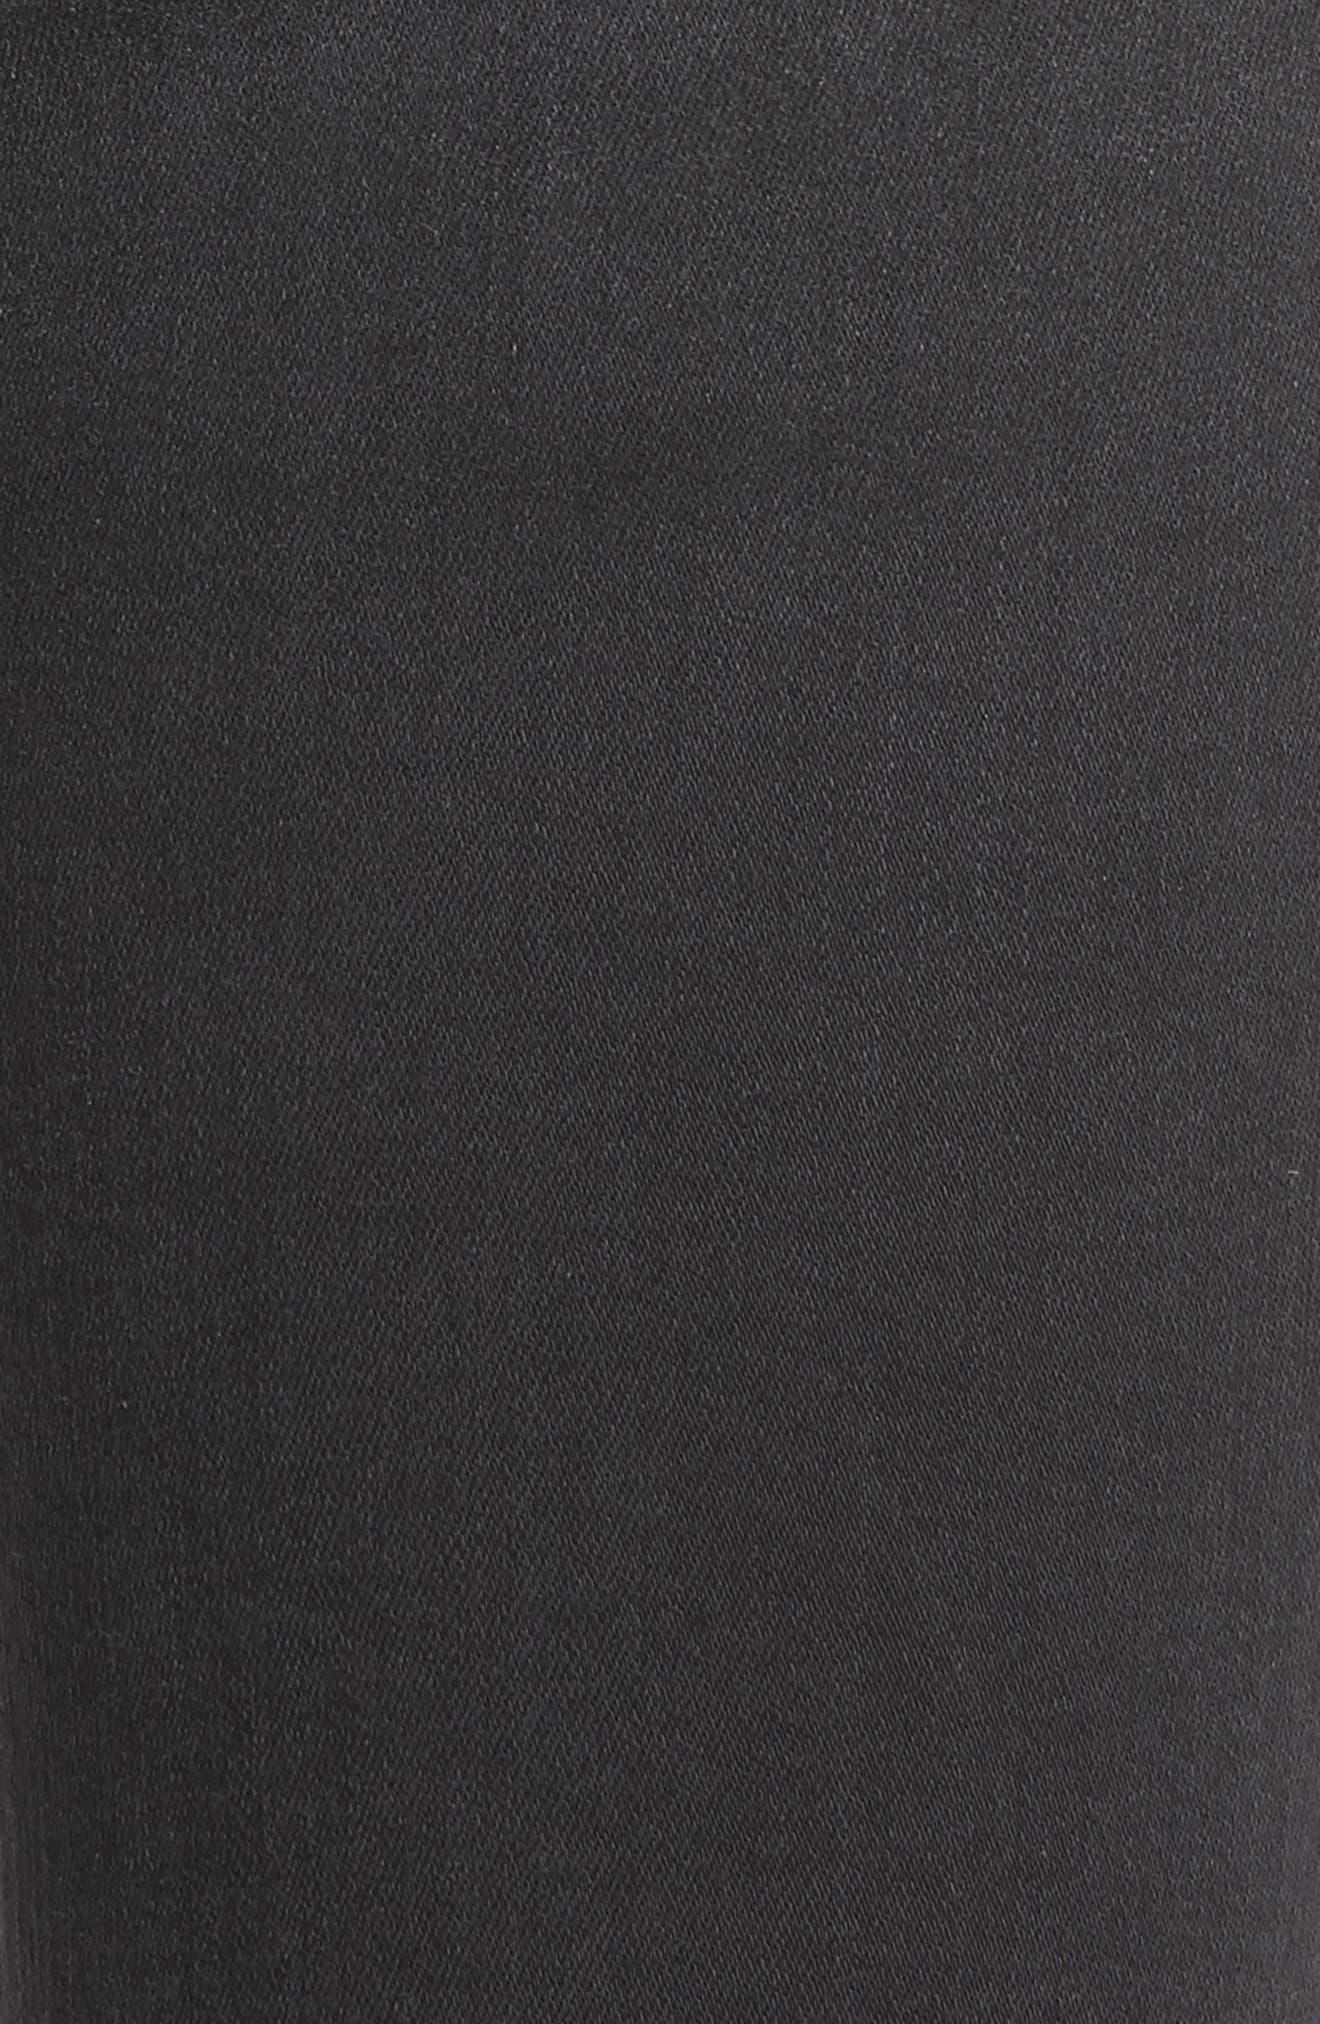 Belvedere Skinny Jeans,                             Alternate thumbnail 5, color,                             001